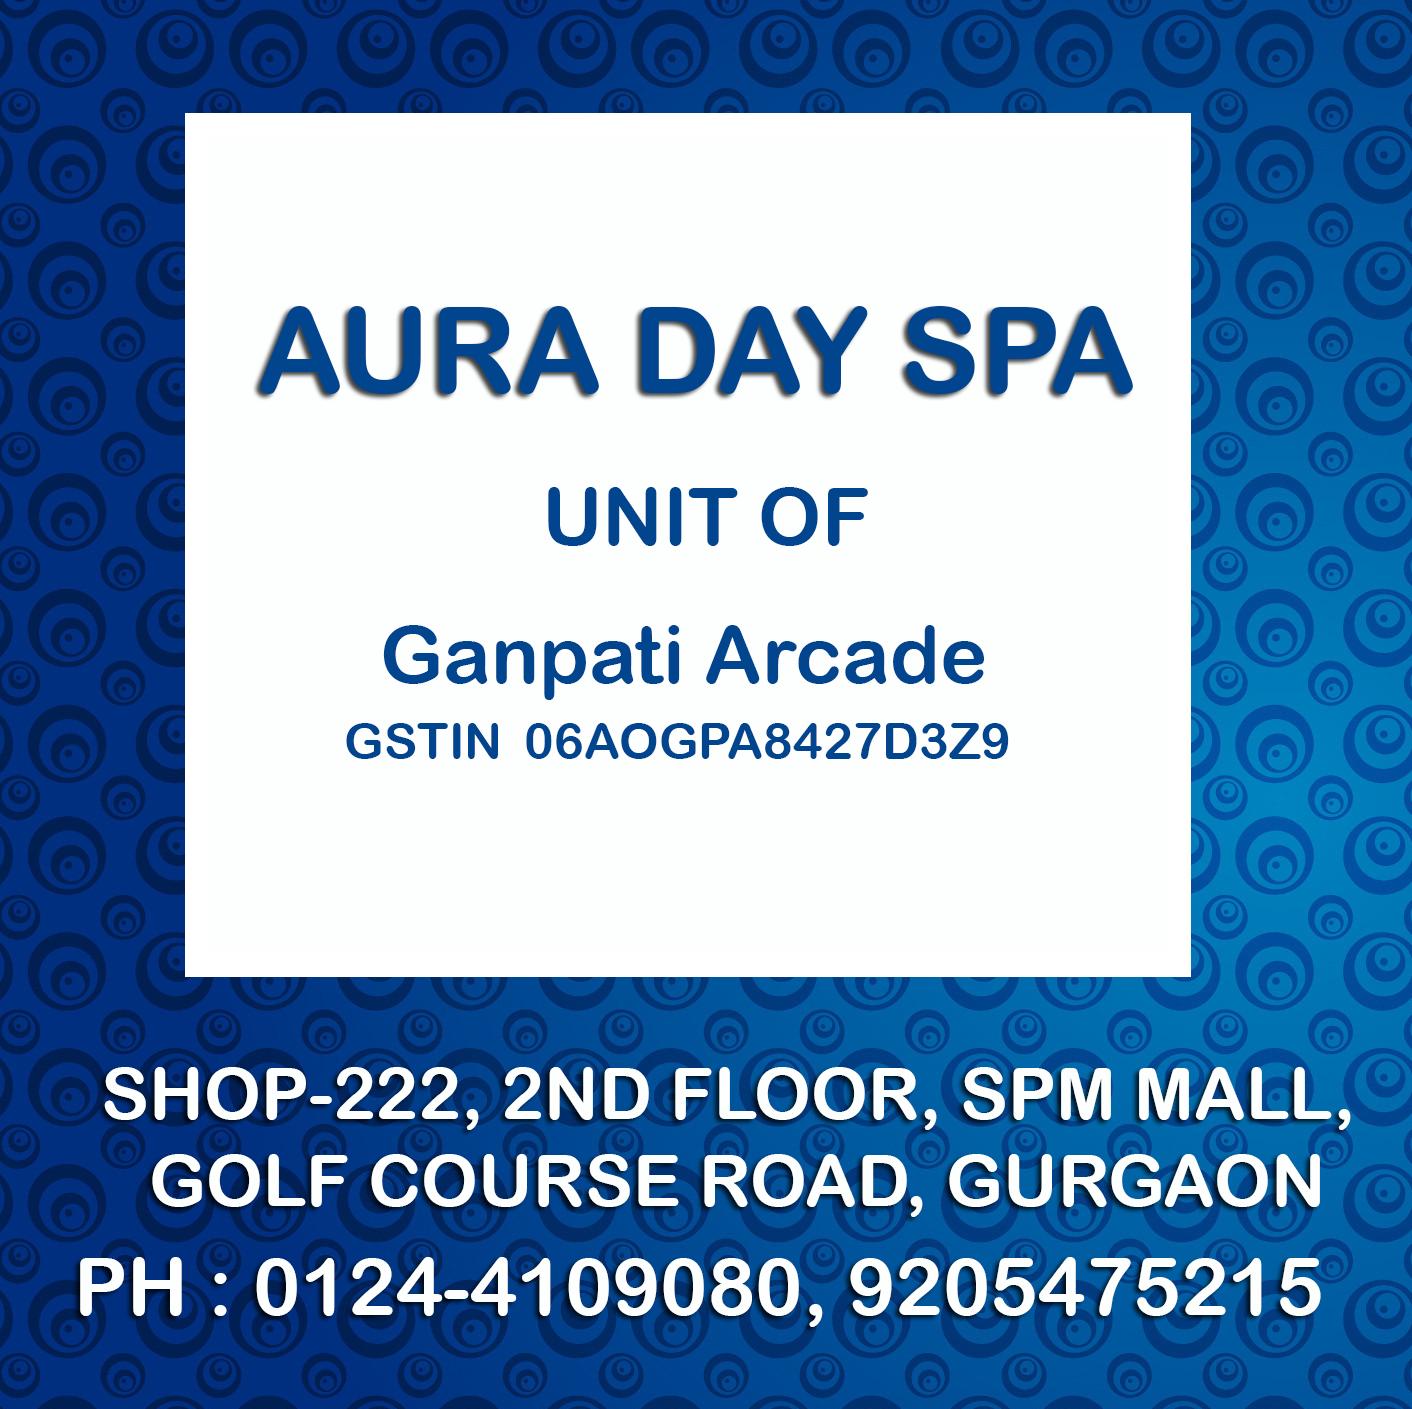 Aura Day Spa - South Point Mall - Gurgaon